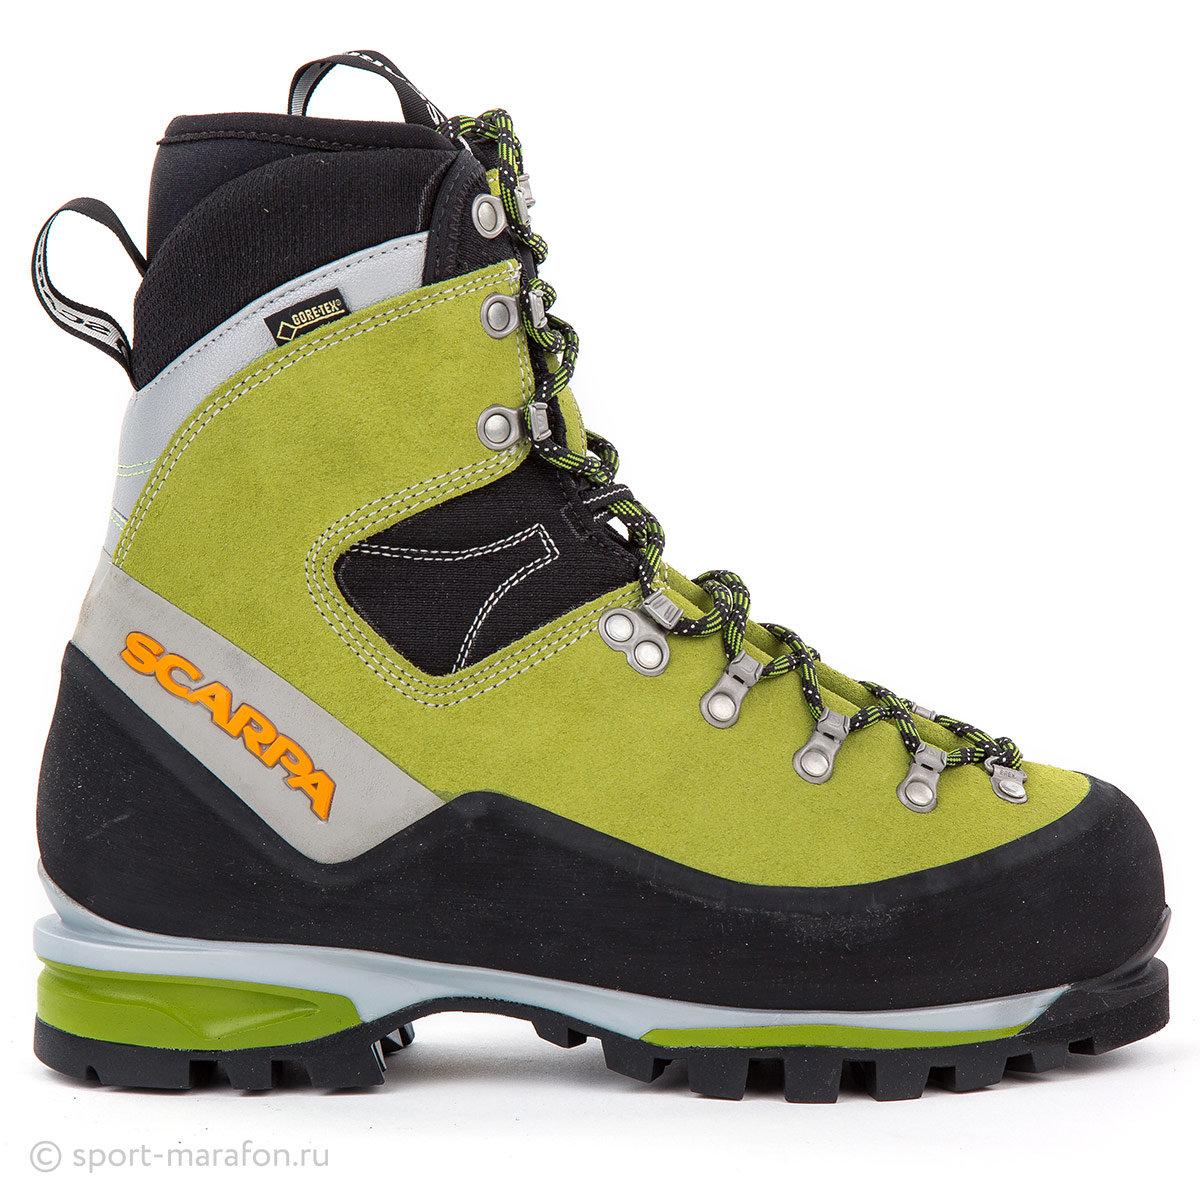 Ботинки женские Scarpa Mont Blanc gtx Suede Kiwi